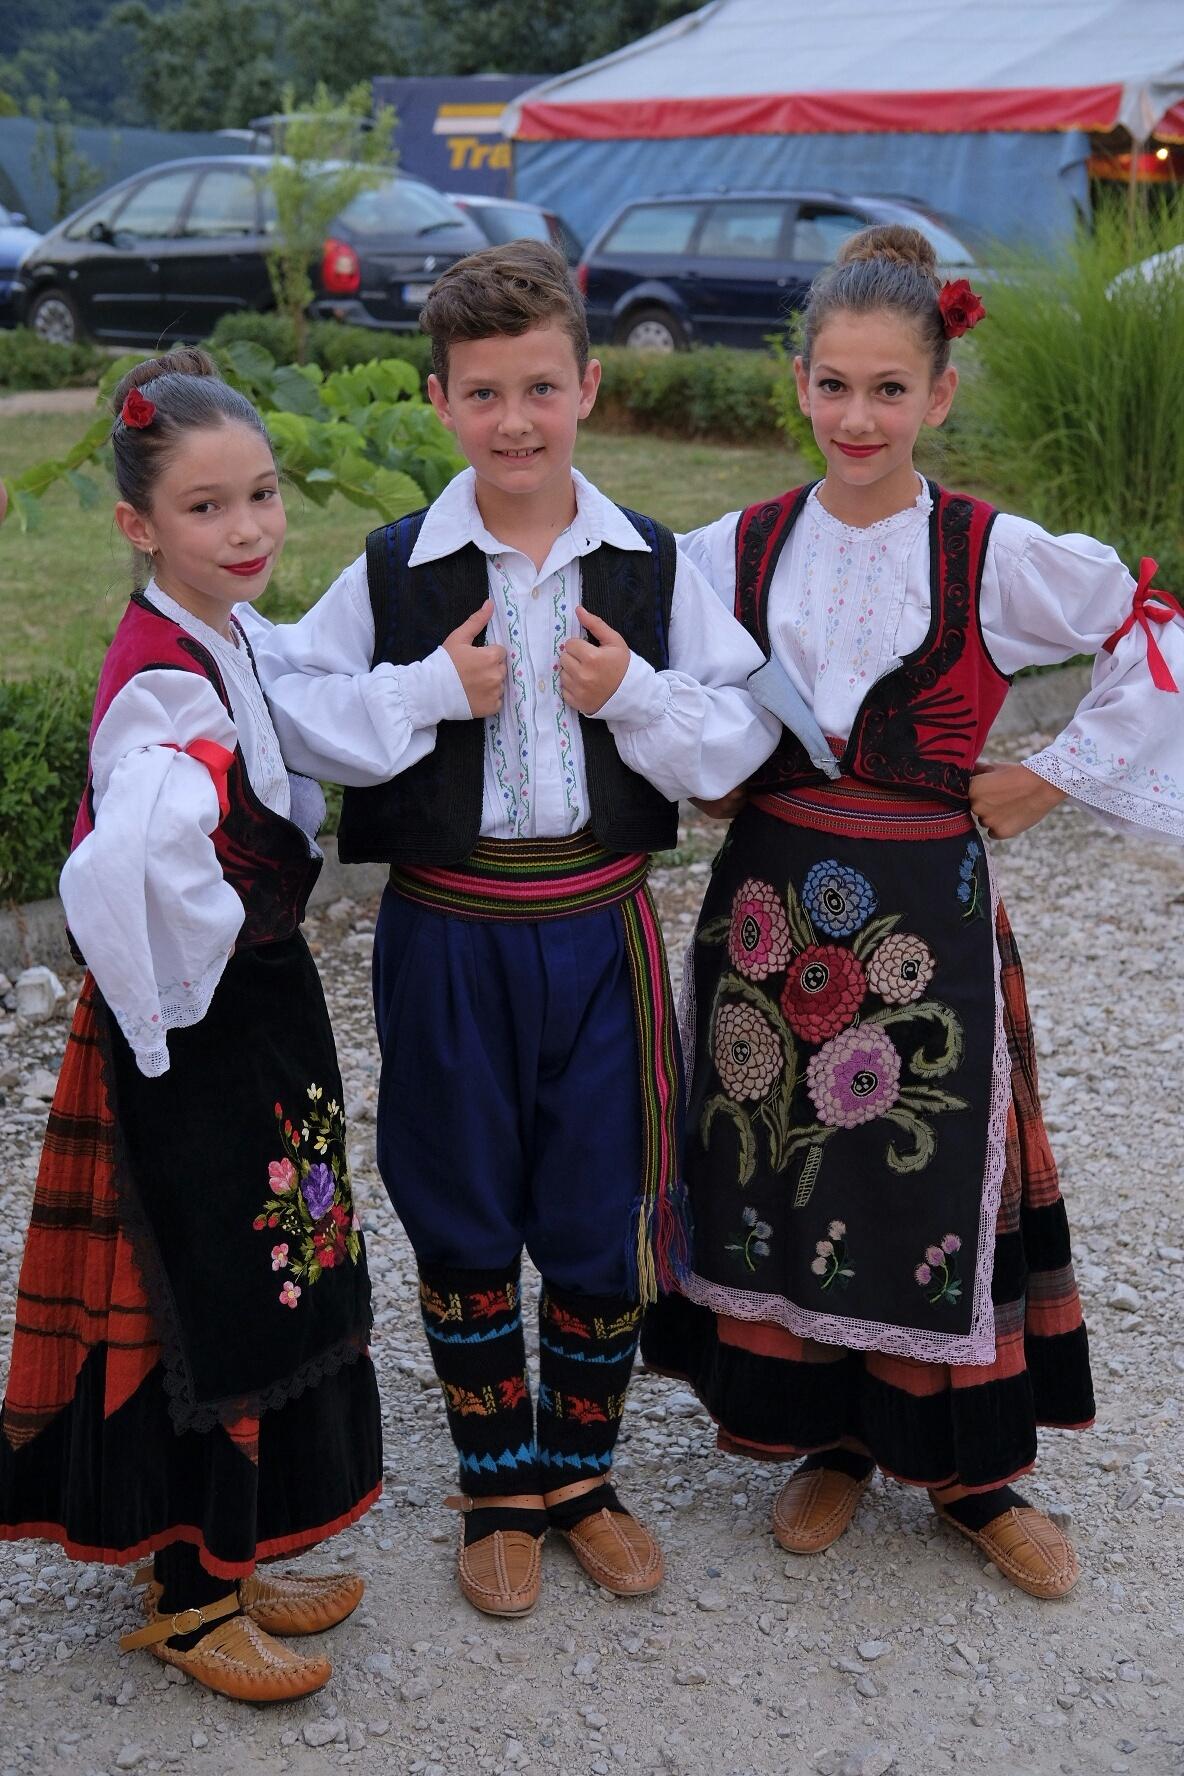 Serbian children celebrate Saint Peter's day by Goran Jorganovich